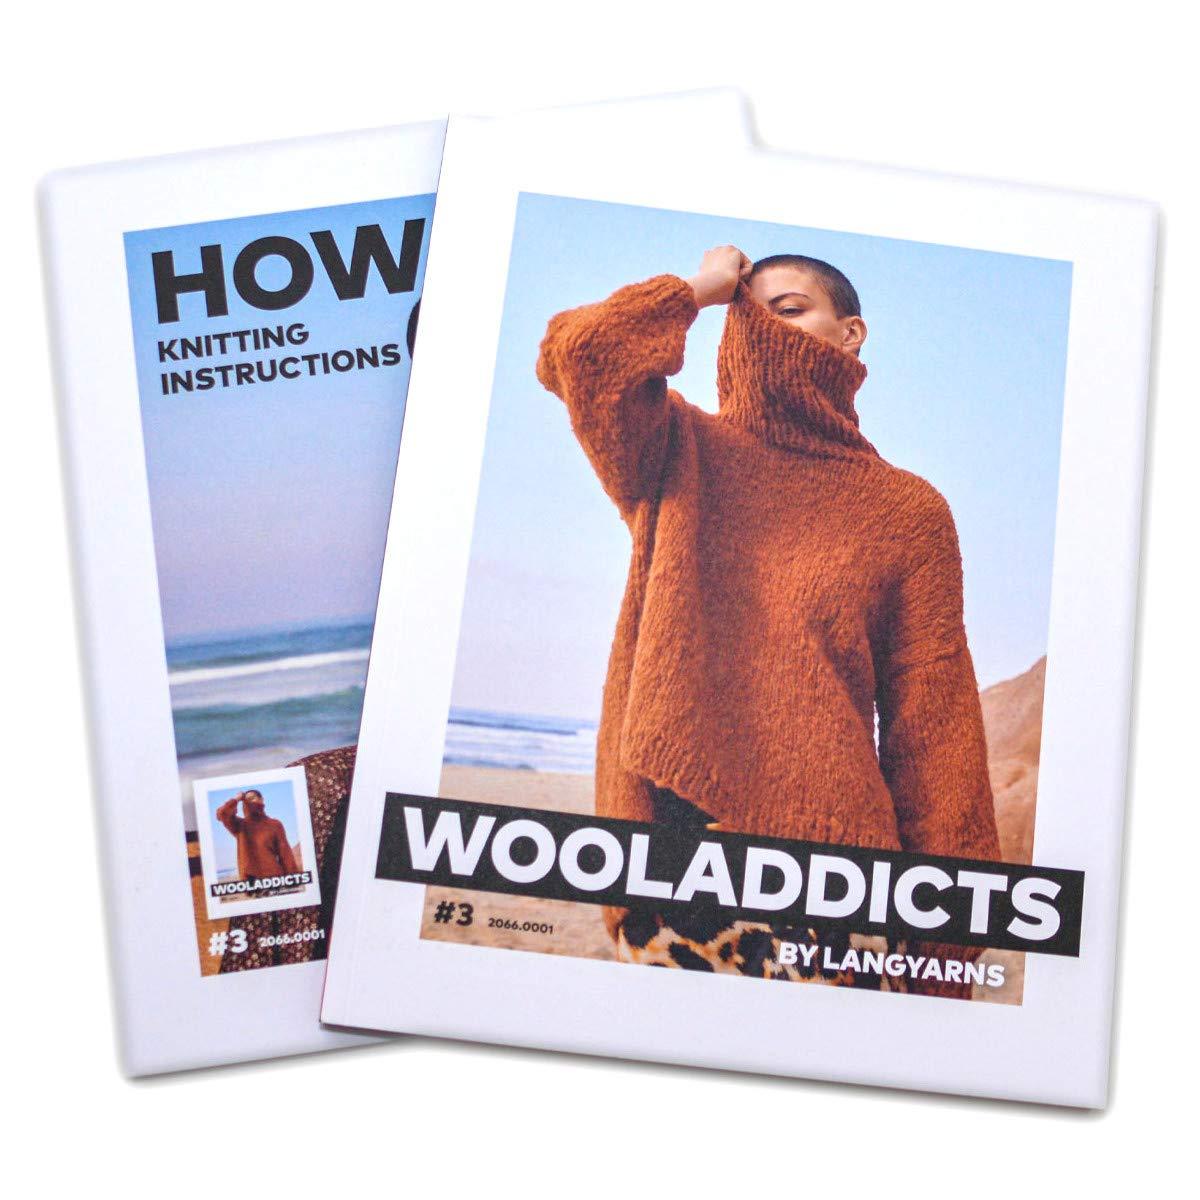 WoolAddicts LANGYARNS Magazine #3